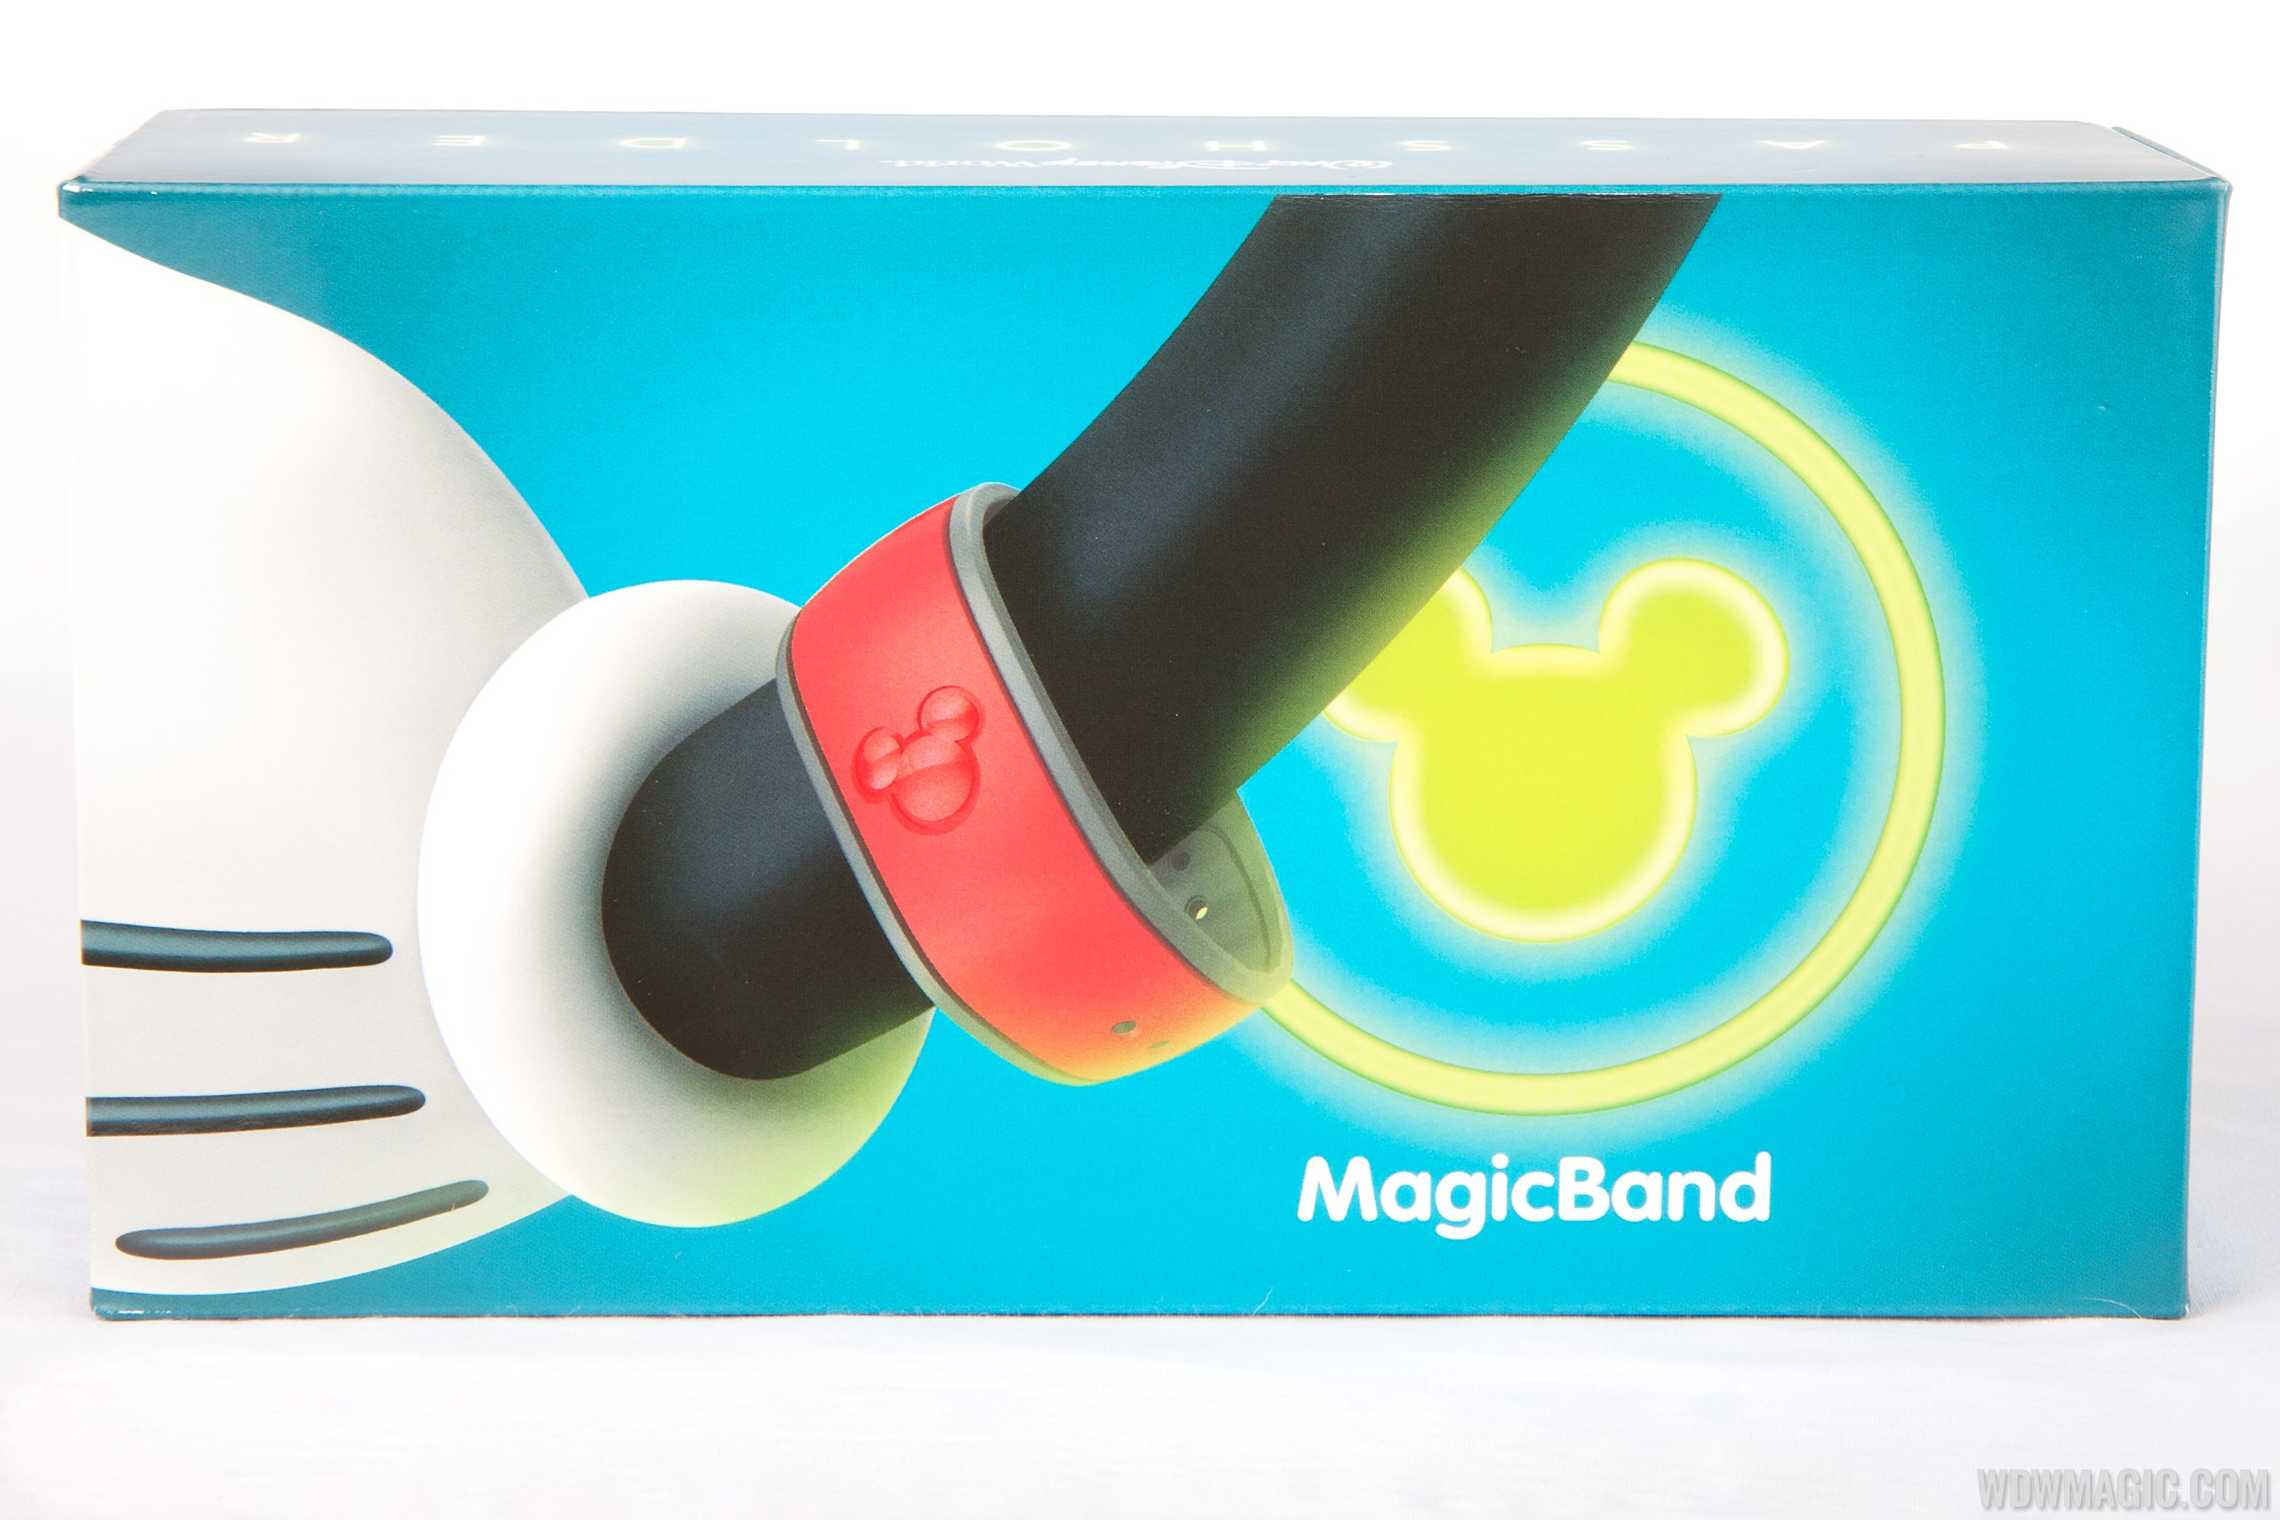 MagicBand passholder box top view